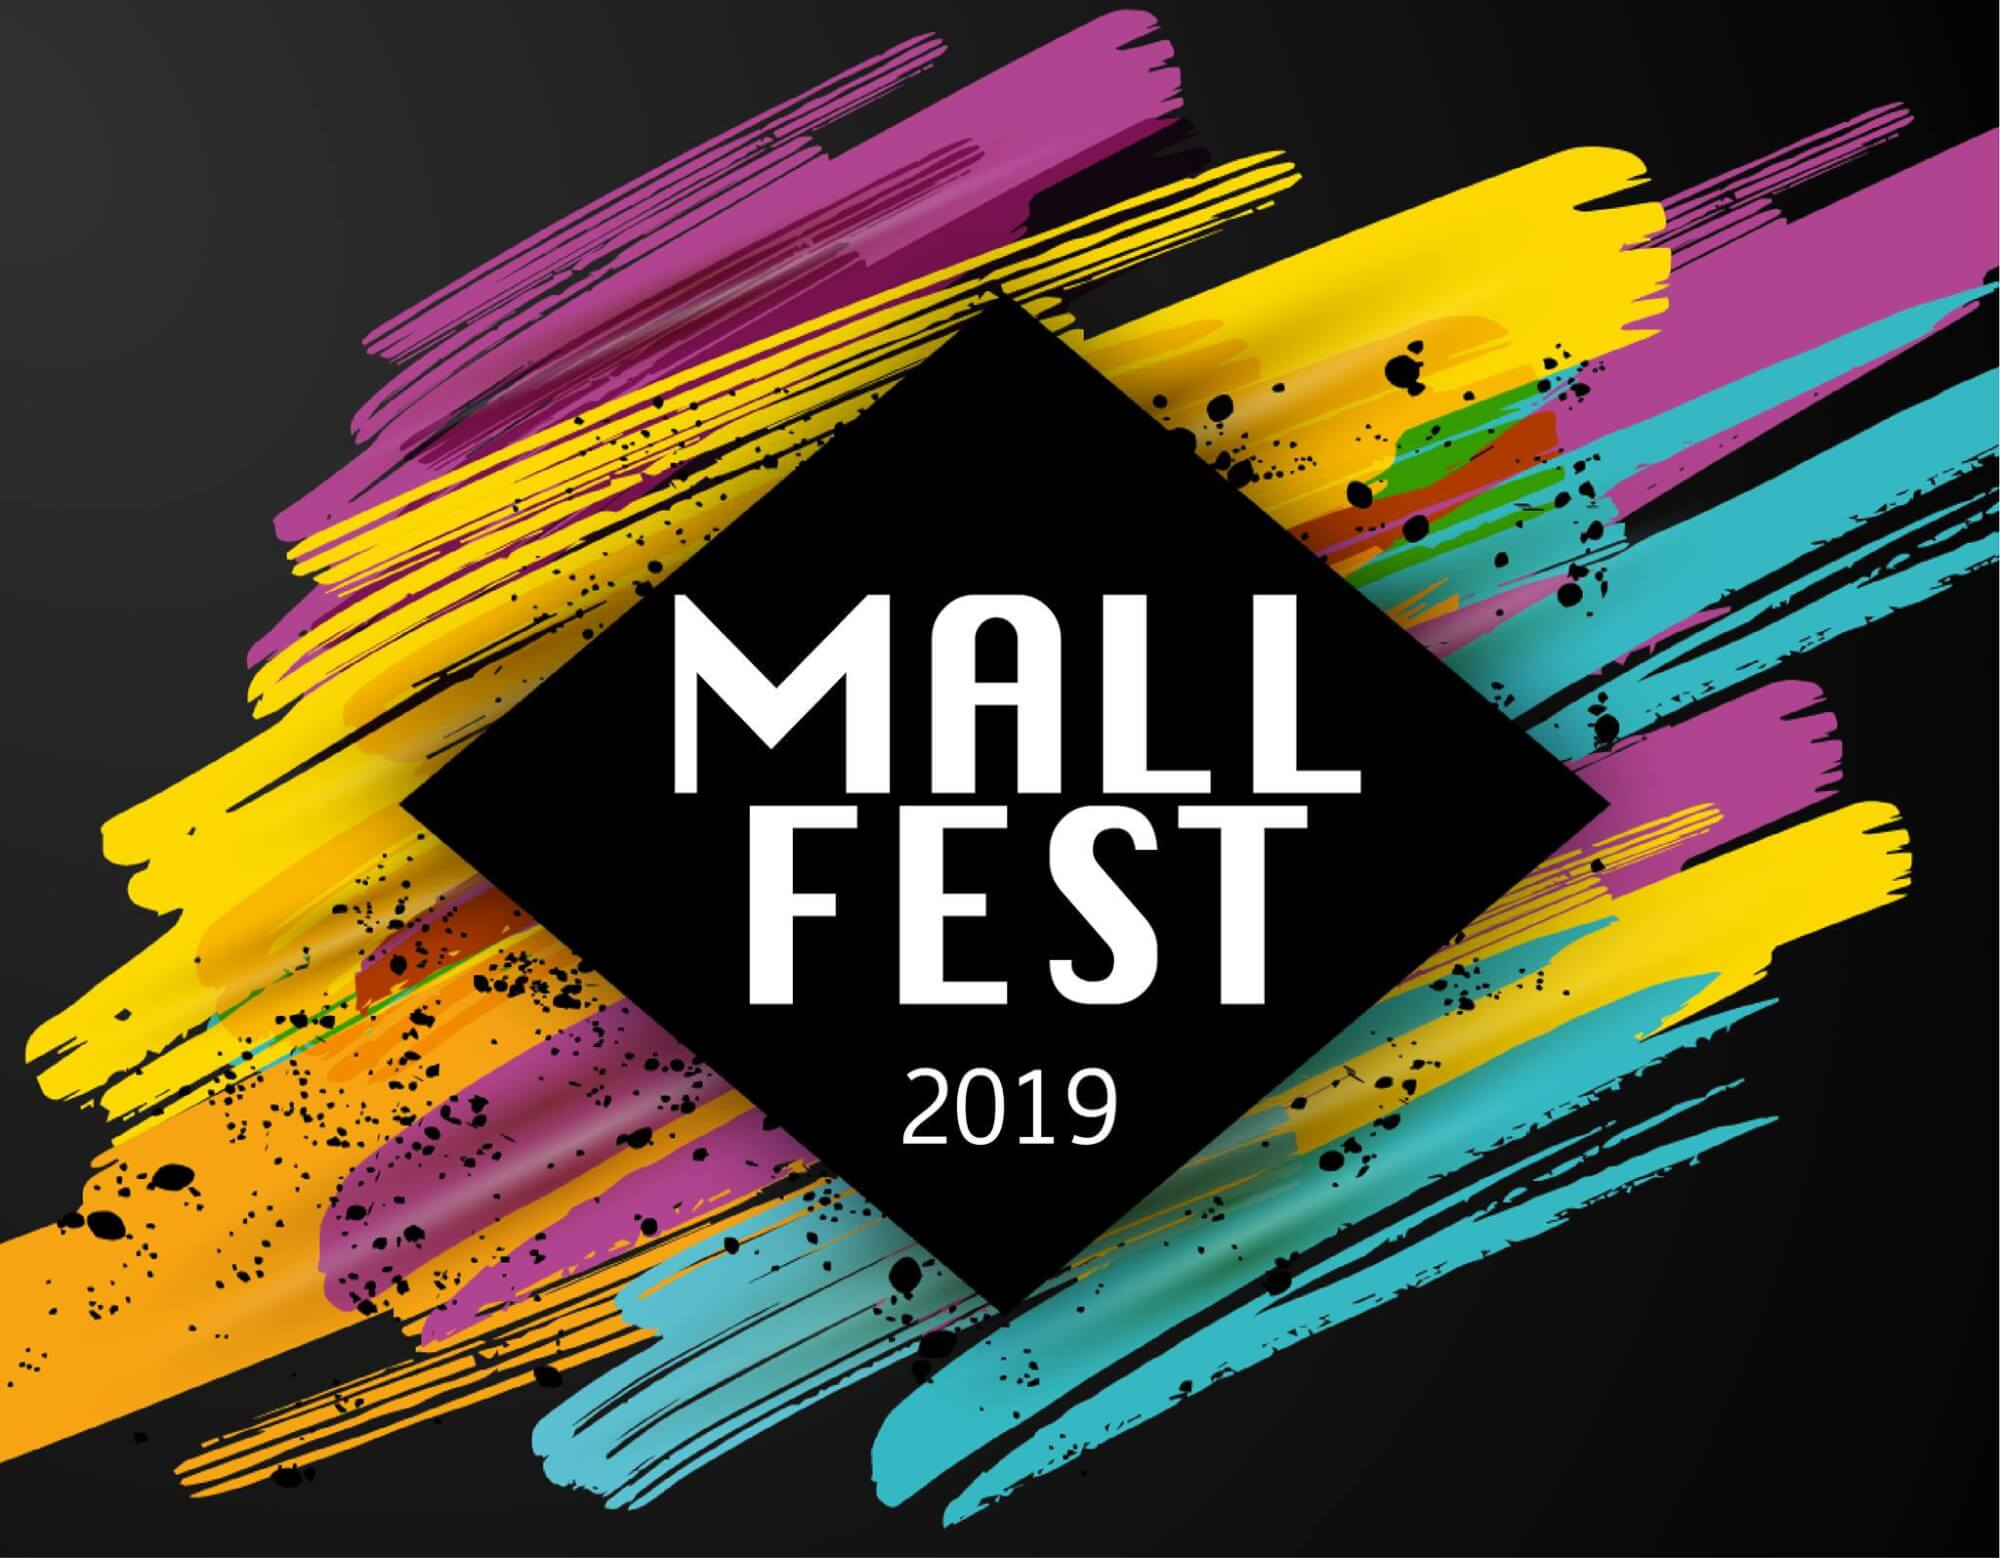 Poster: Mall Fest 2019